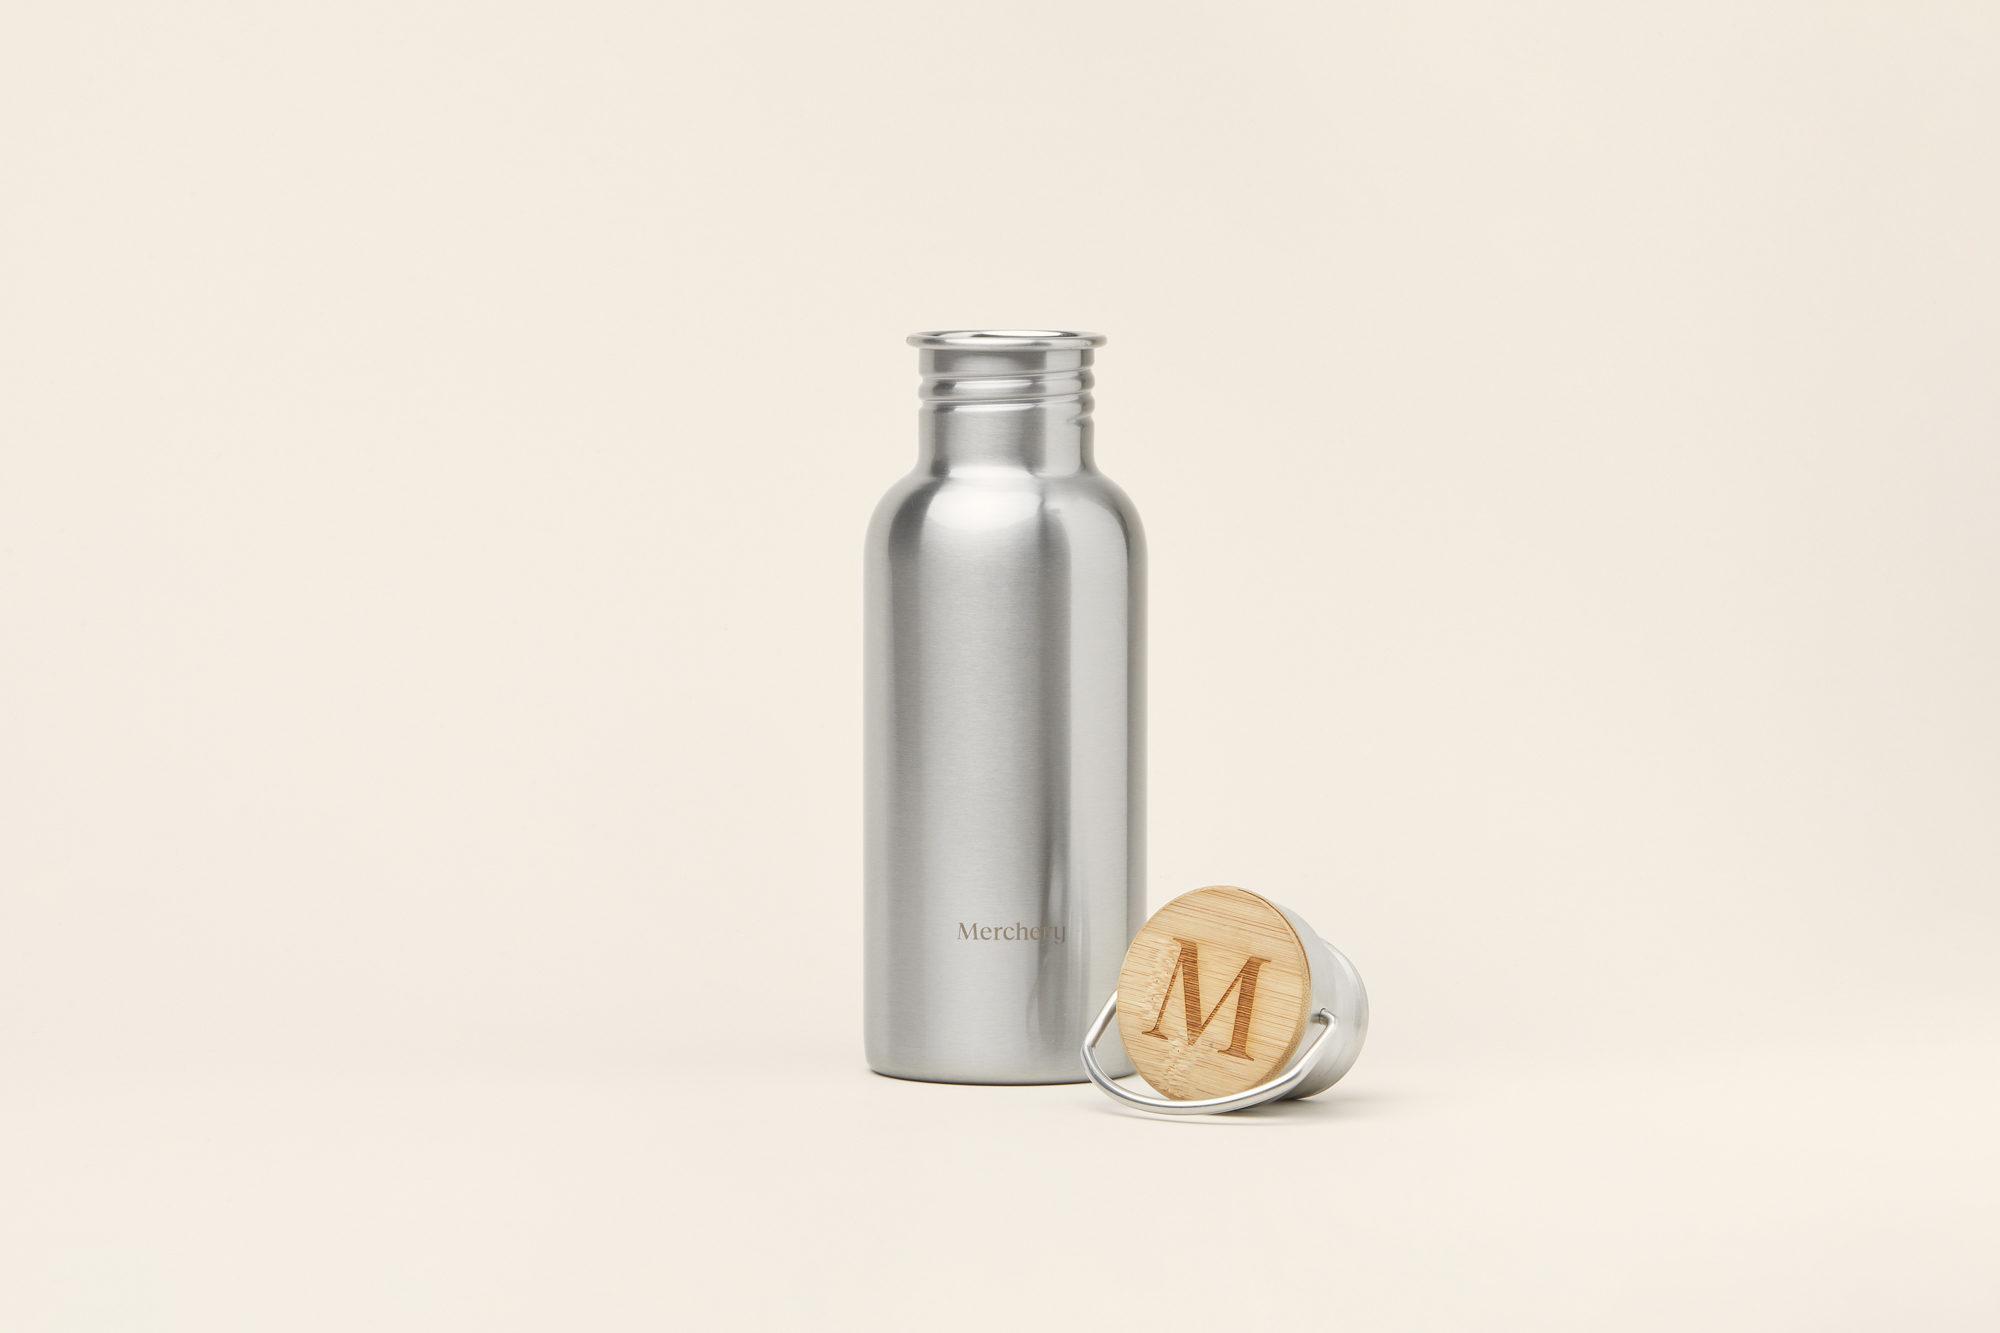 Stainless Steel Bottle - Sustainable Corporate Gift - Merchery